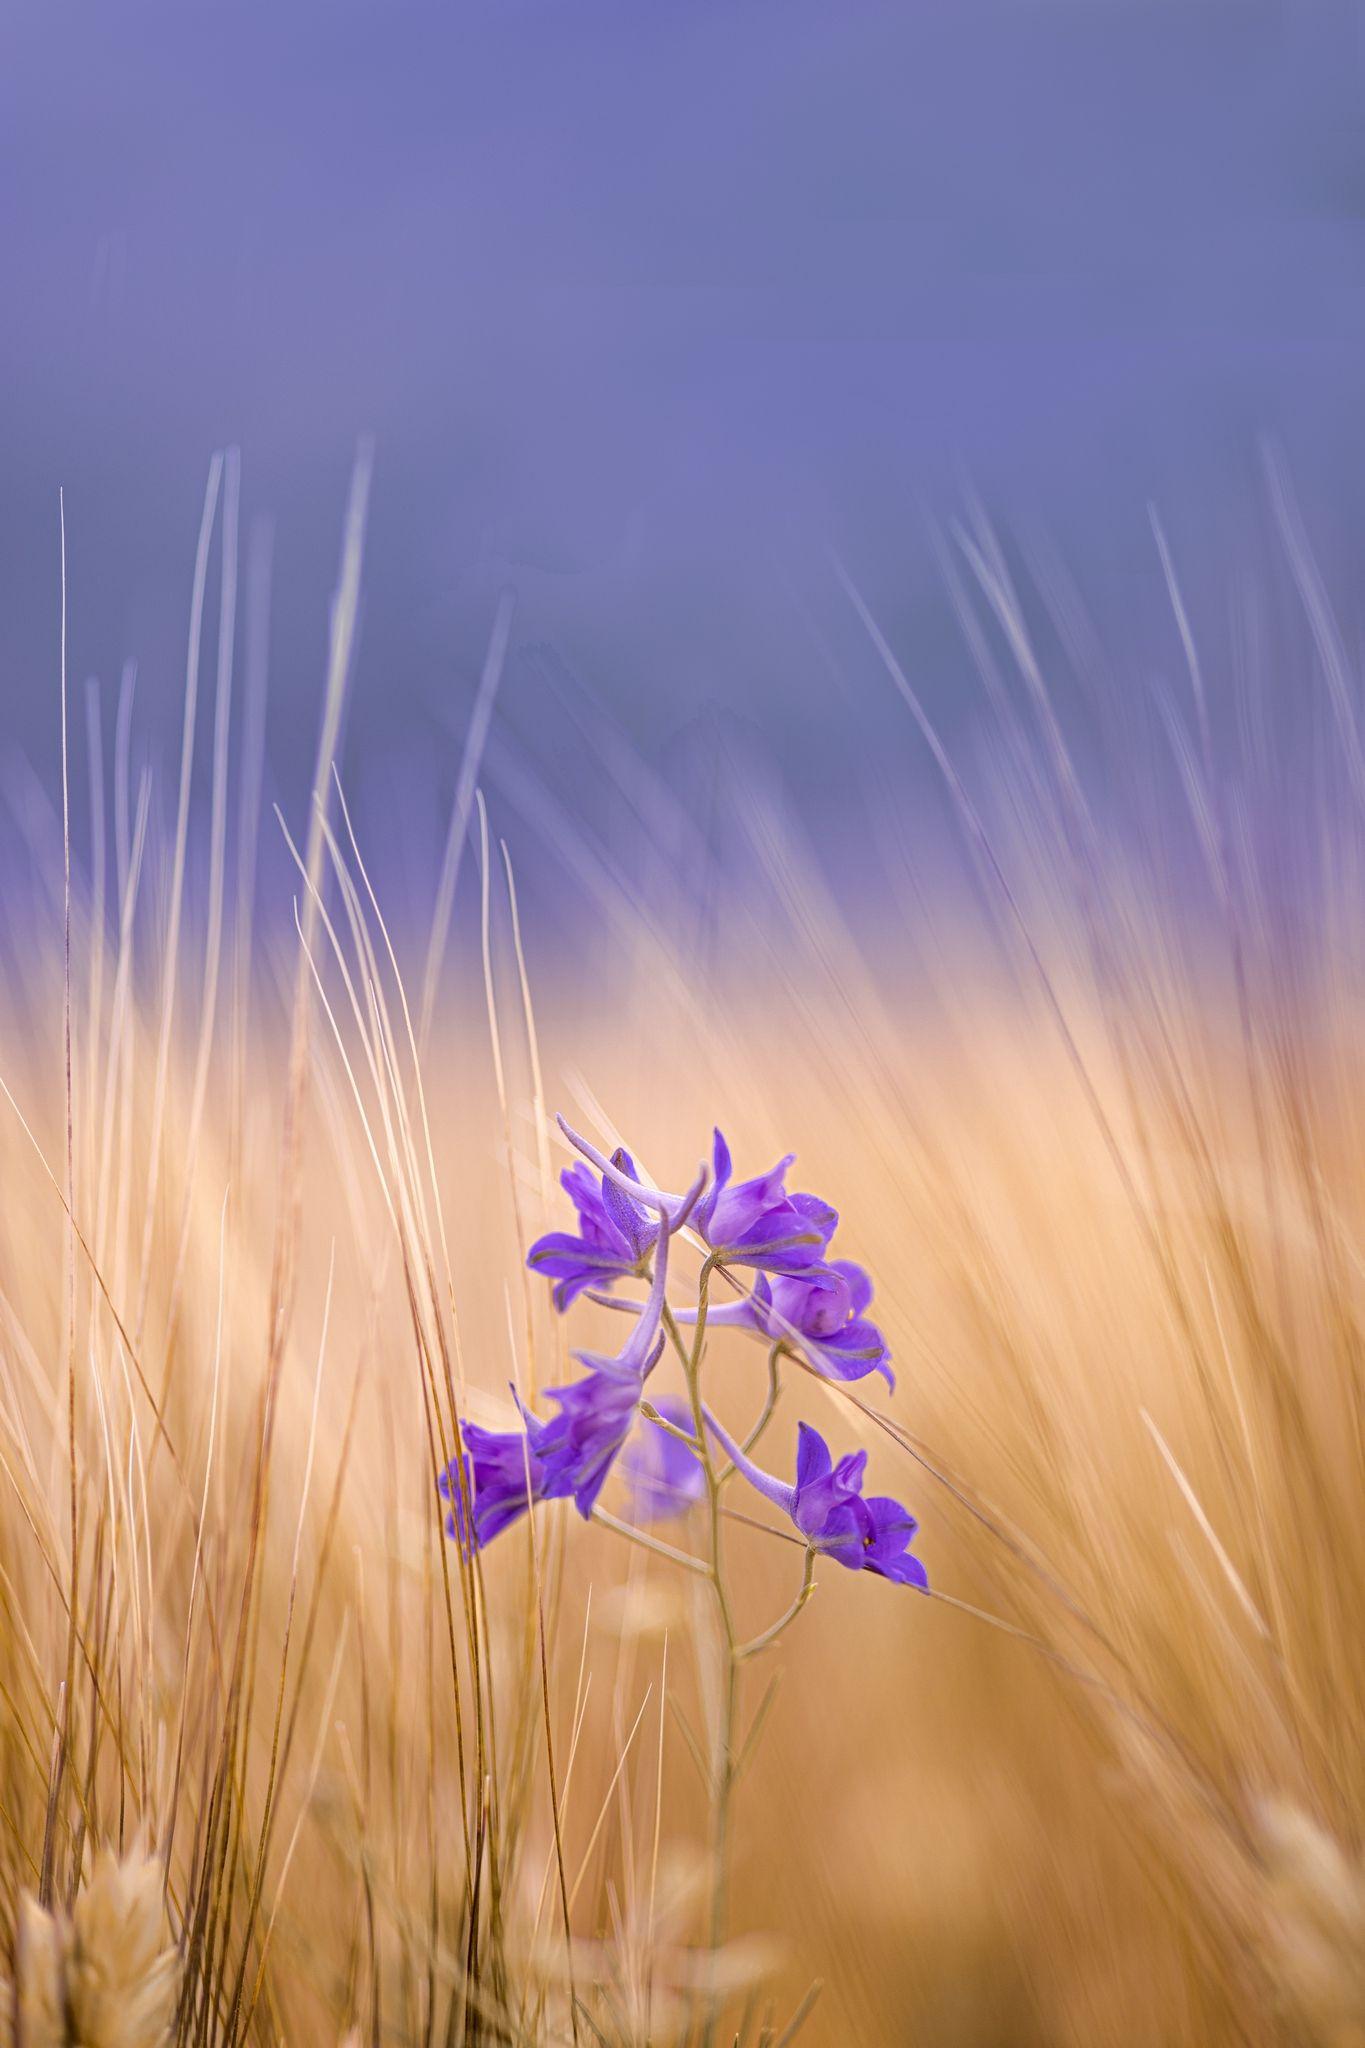 yellow, flowers, wheat, summer, spring, sky, macro, closeup, Righi Eugenia